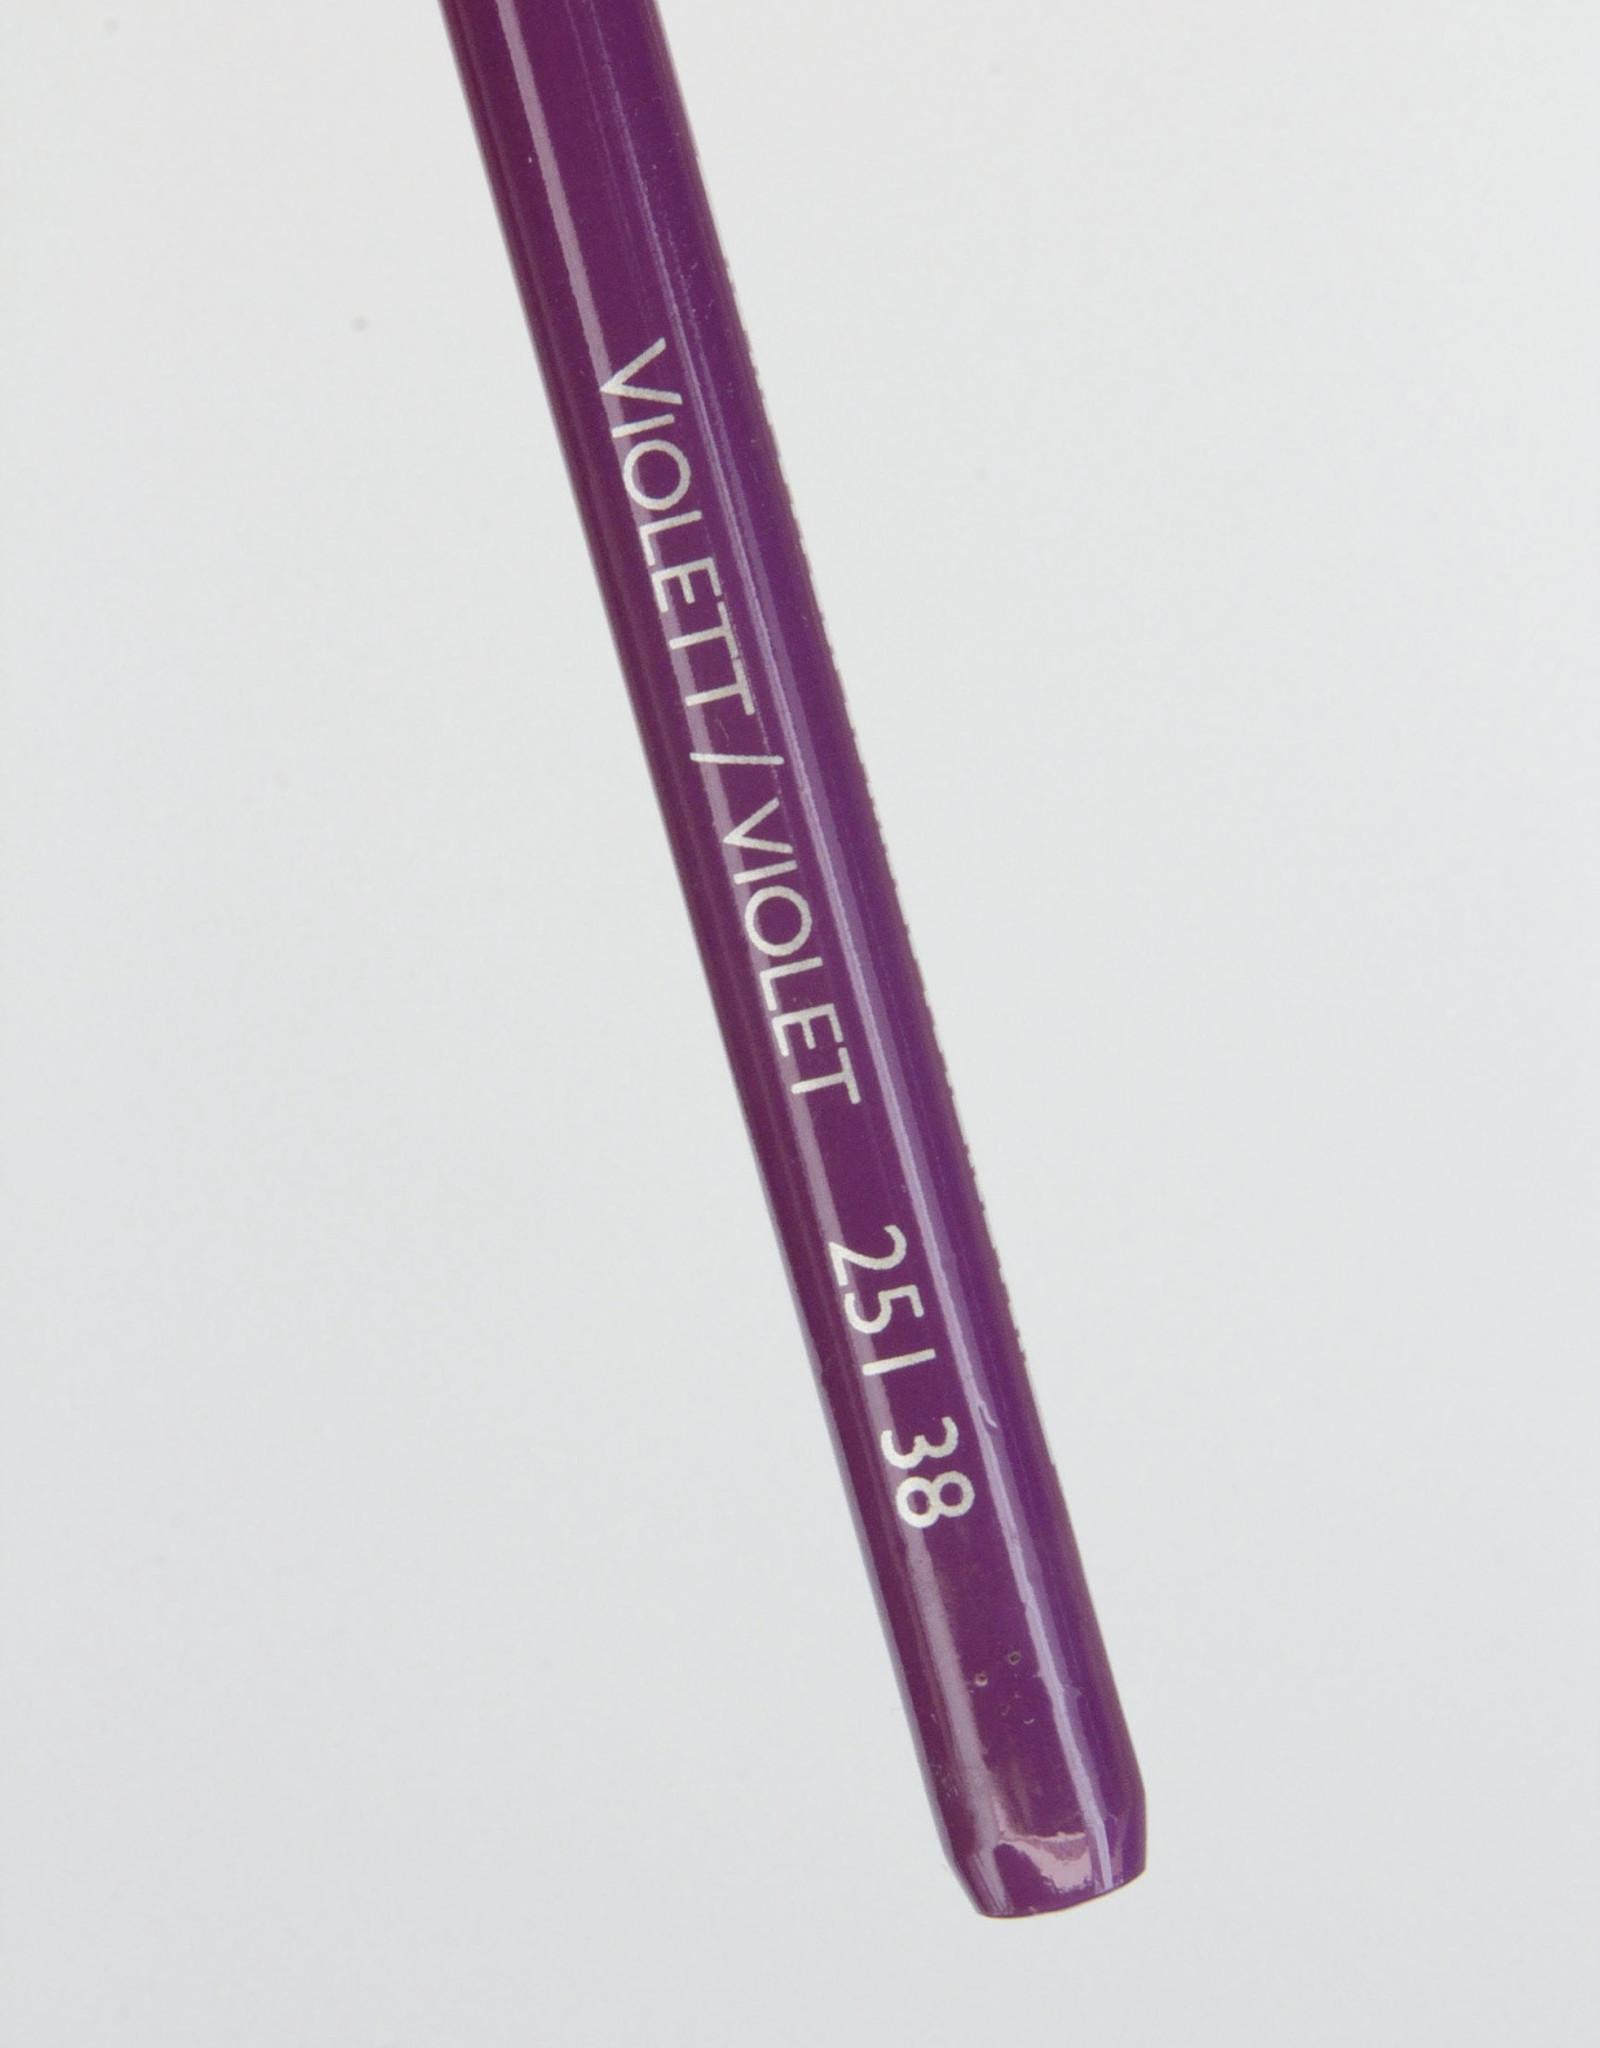 Cretacolor, Aqua Monolith Pencil, Violet